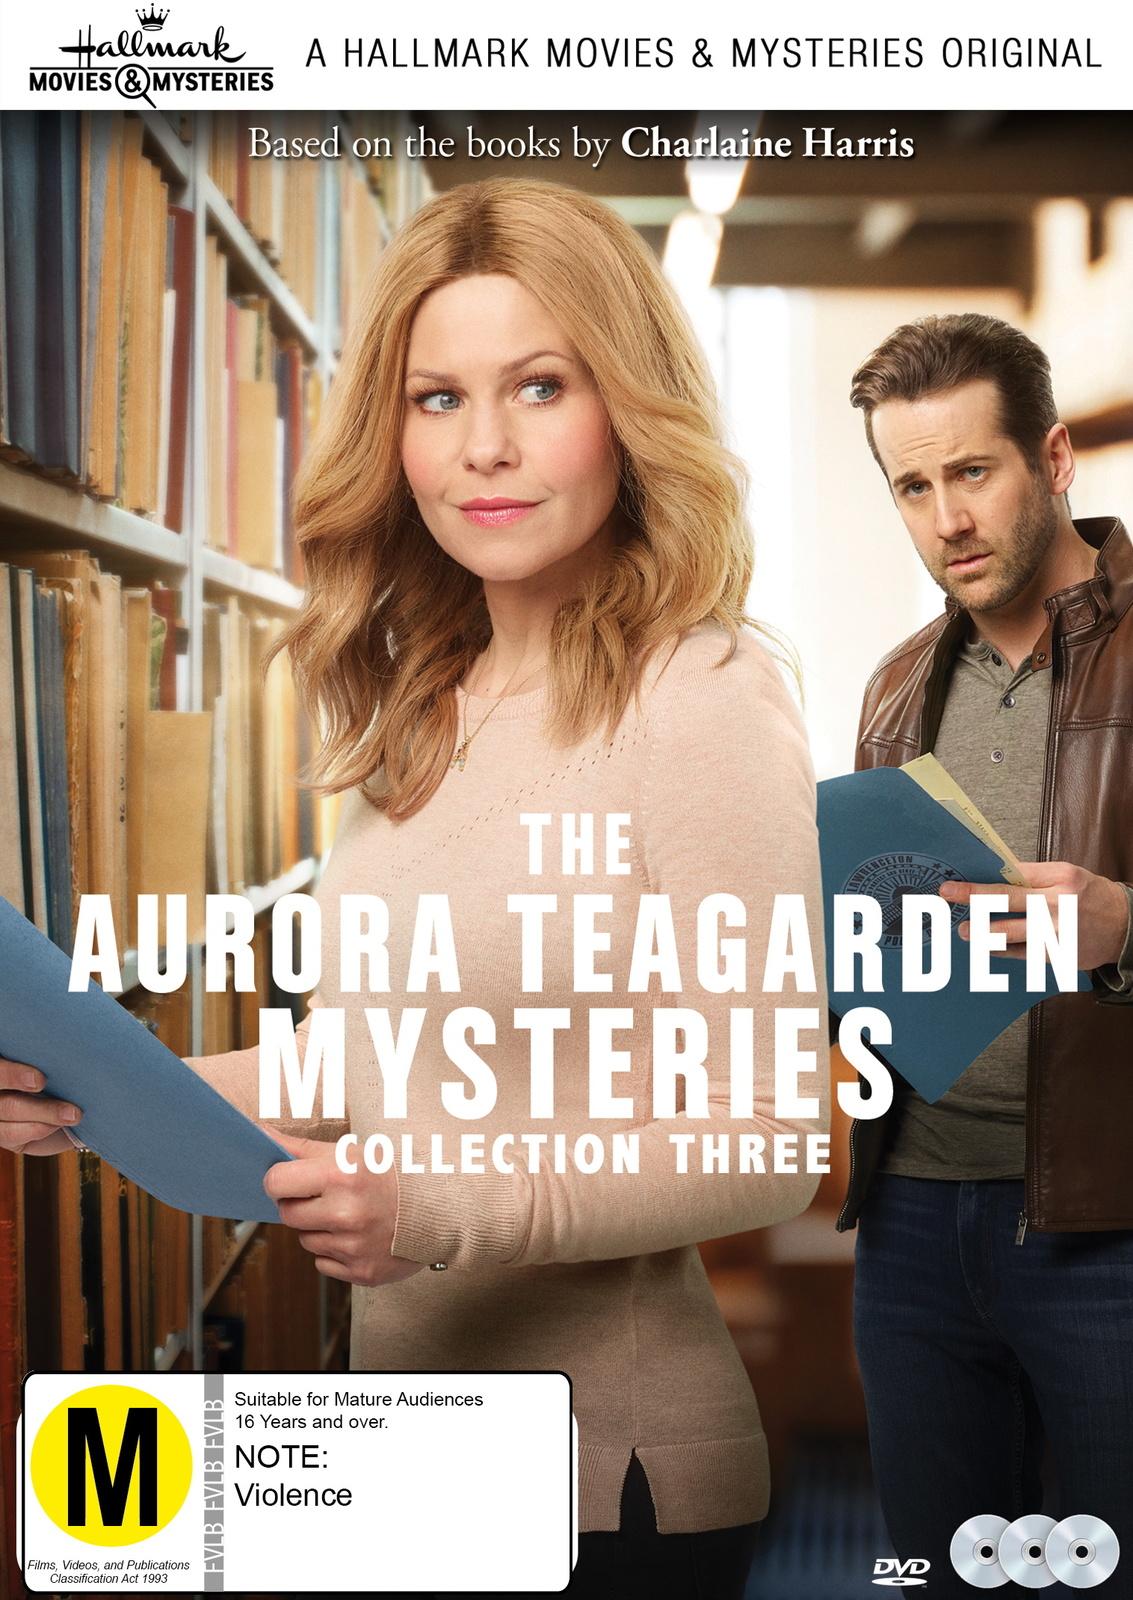 The Aurora Teagarden Mysteries: Collection 3 image